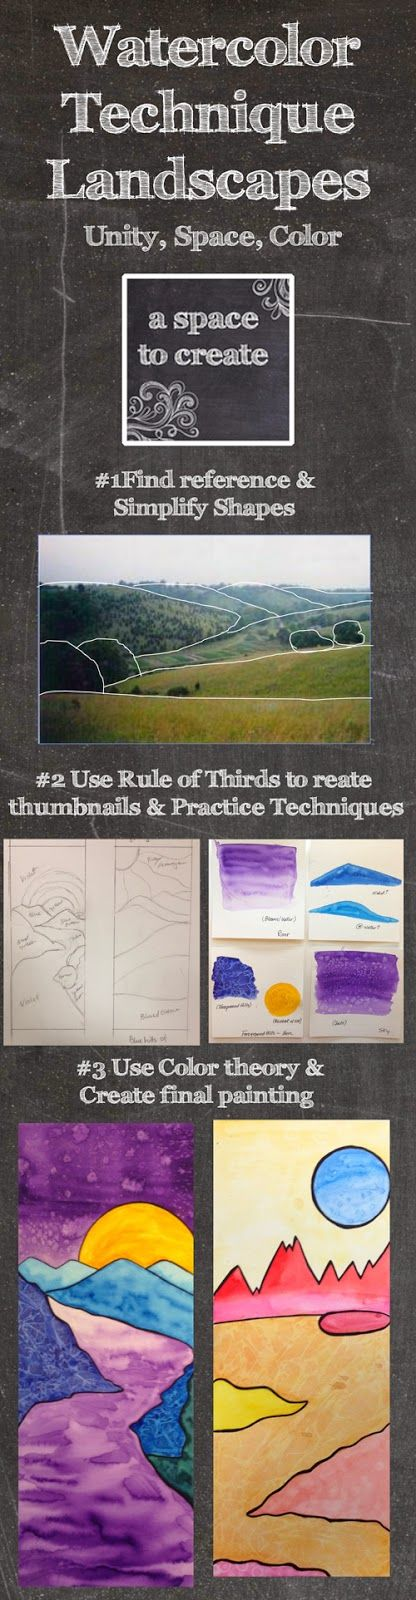 Watercolor Technique Landscapes - A Space to Create blog post